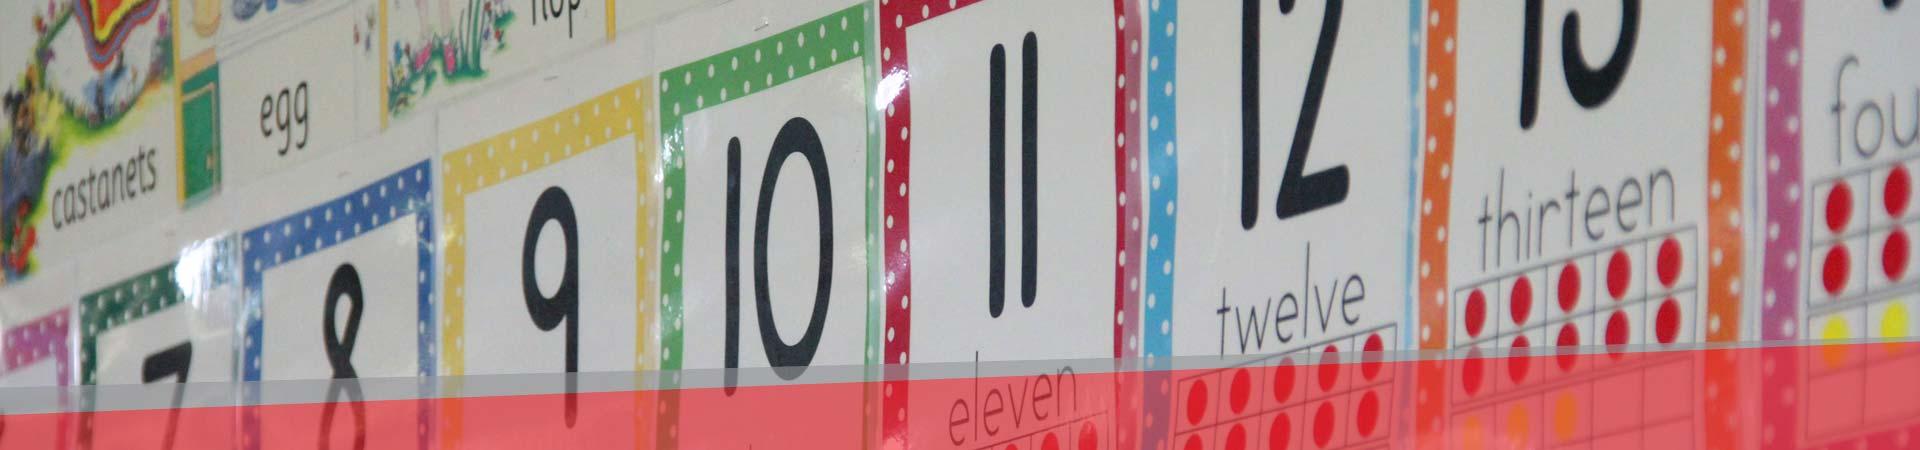 mathamatics at spearwood primary school